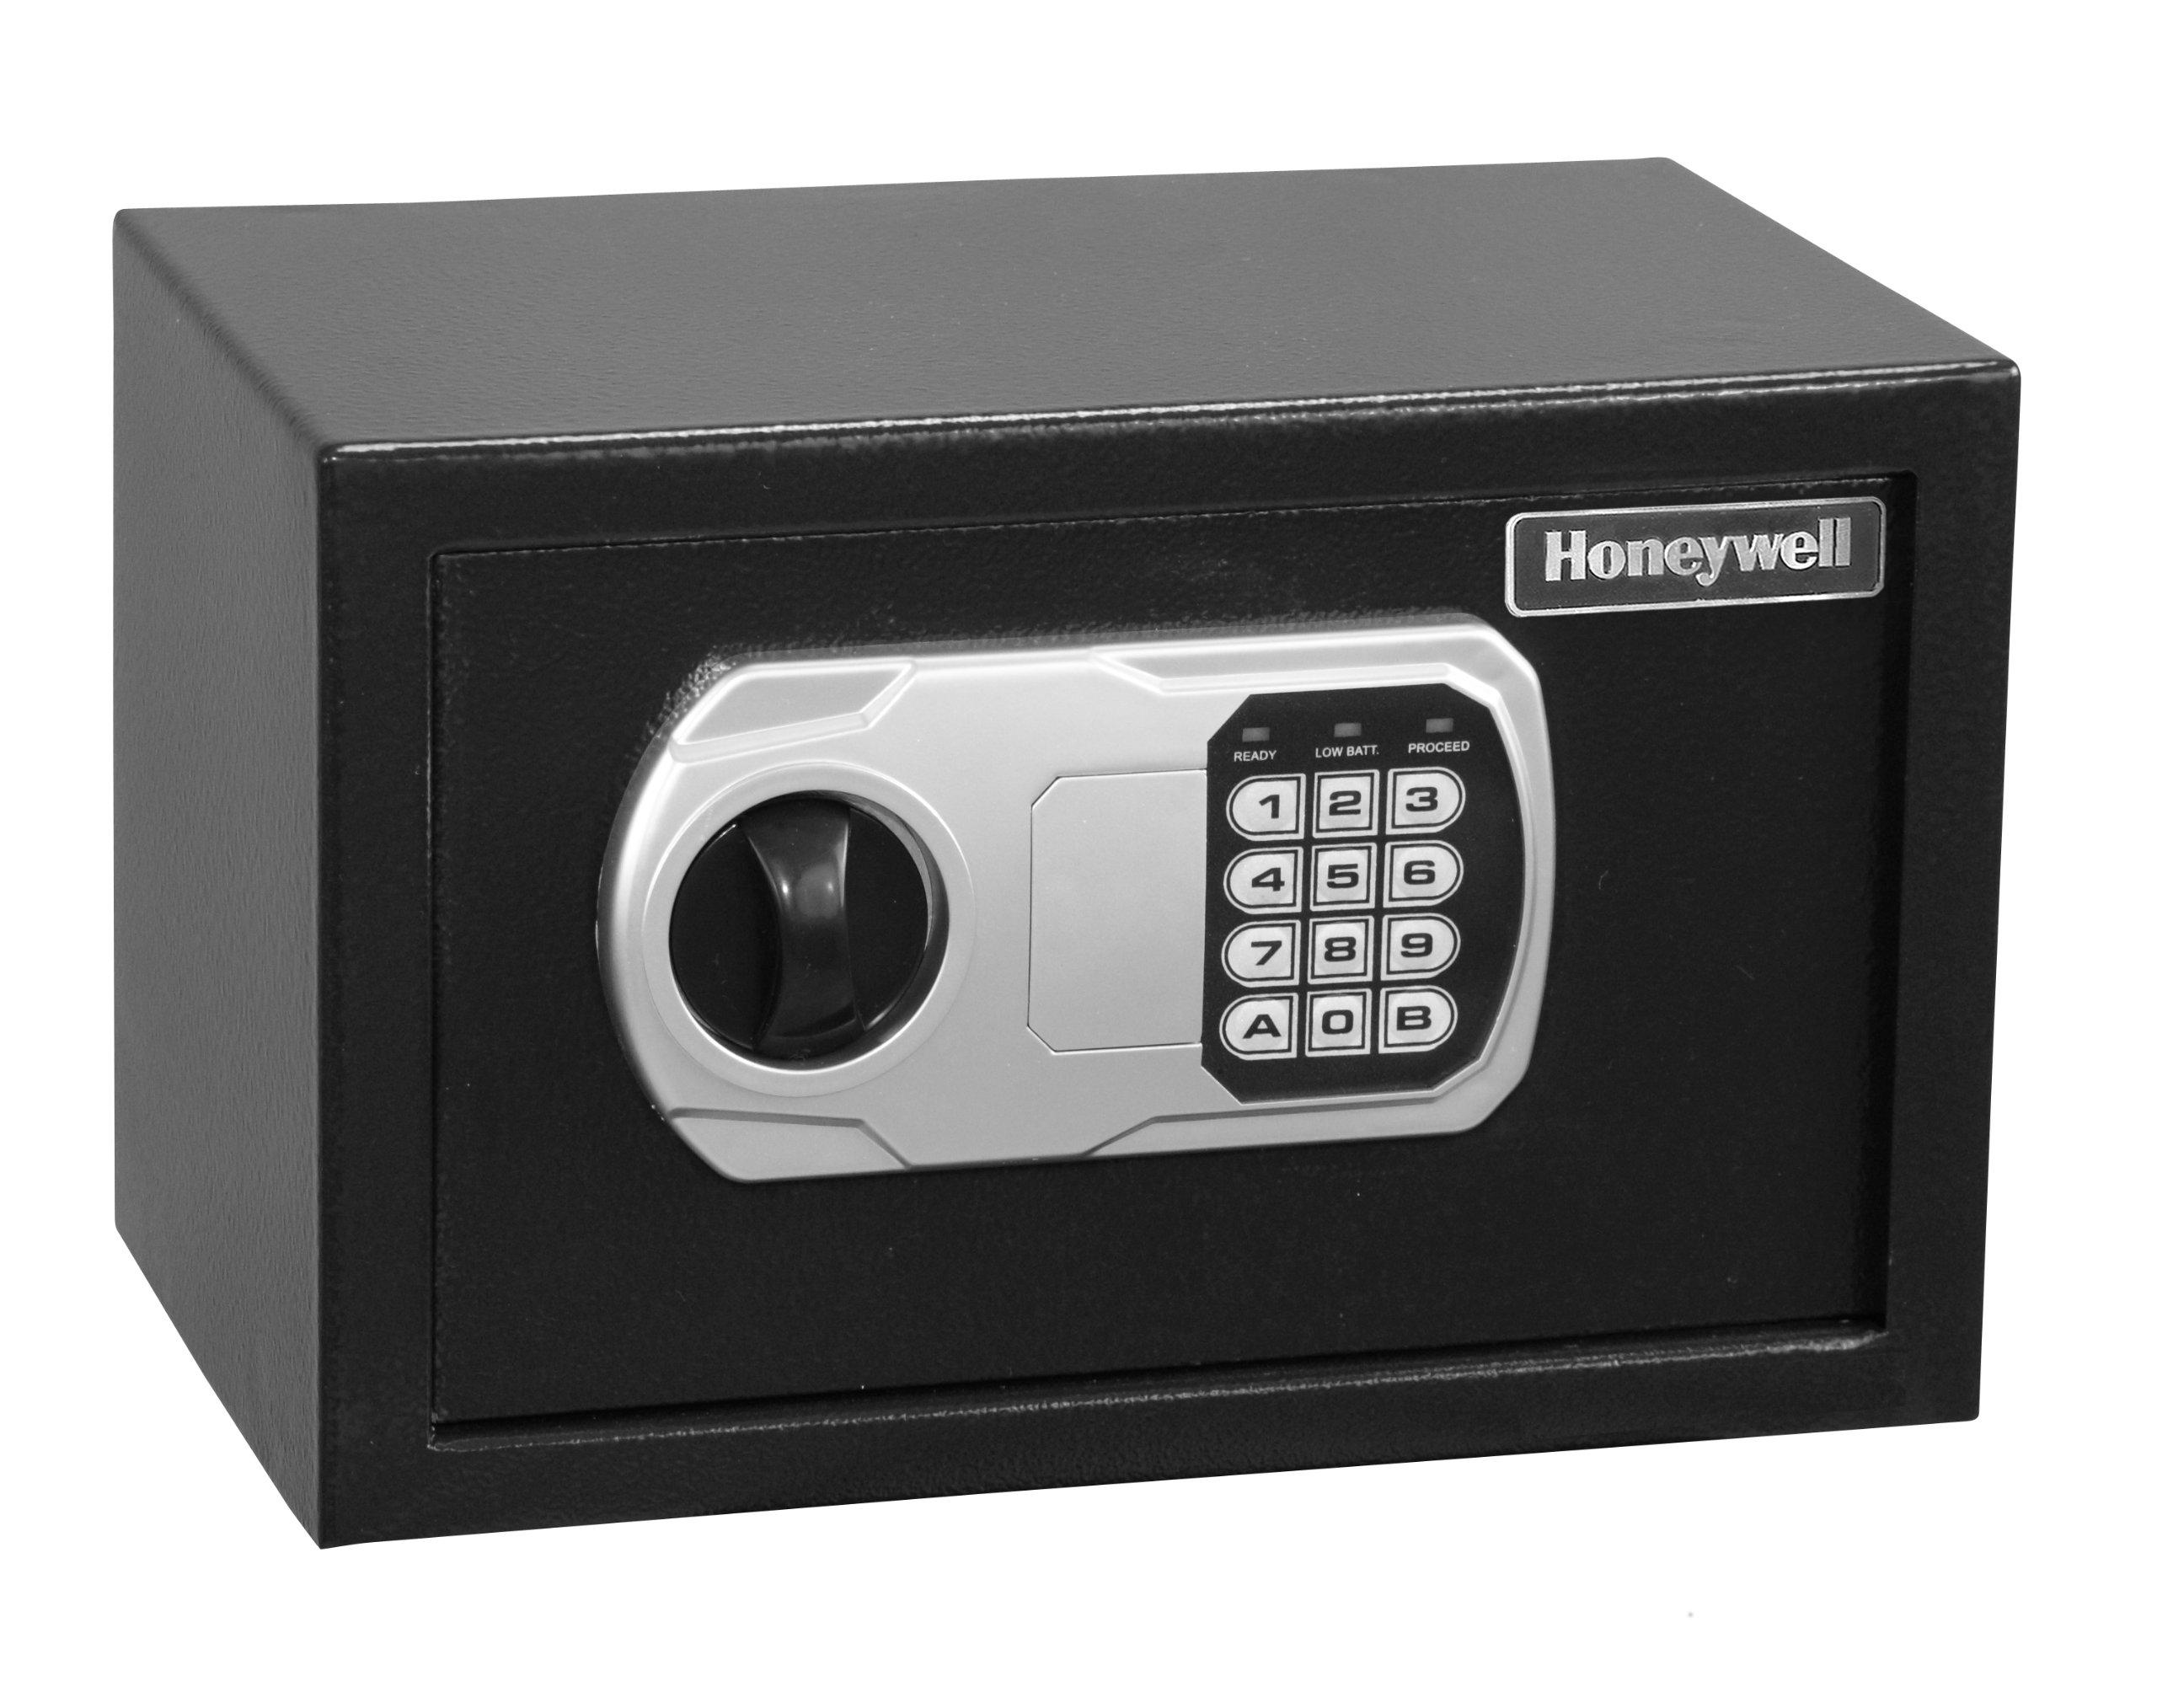 HONEYWELL - 5101DOJ Approved Small Security Safe with Digital Lock, 0.27-Cubic Feet, Black by Honeywell Safes & Door Locks